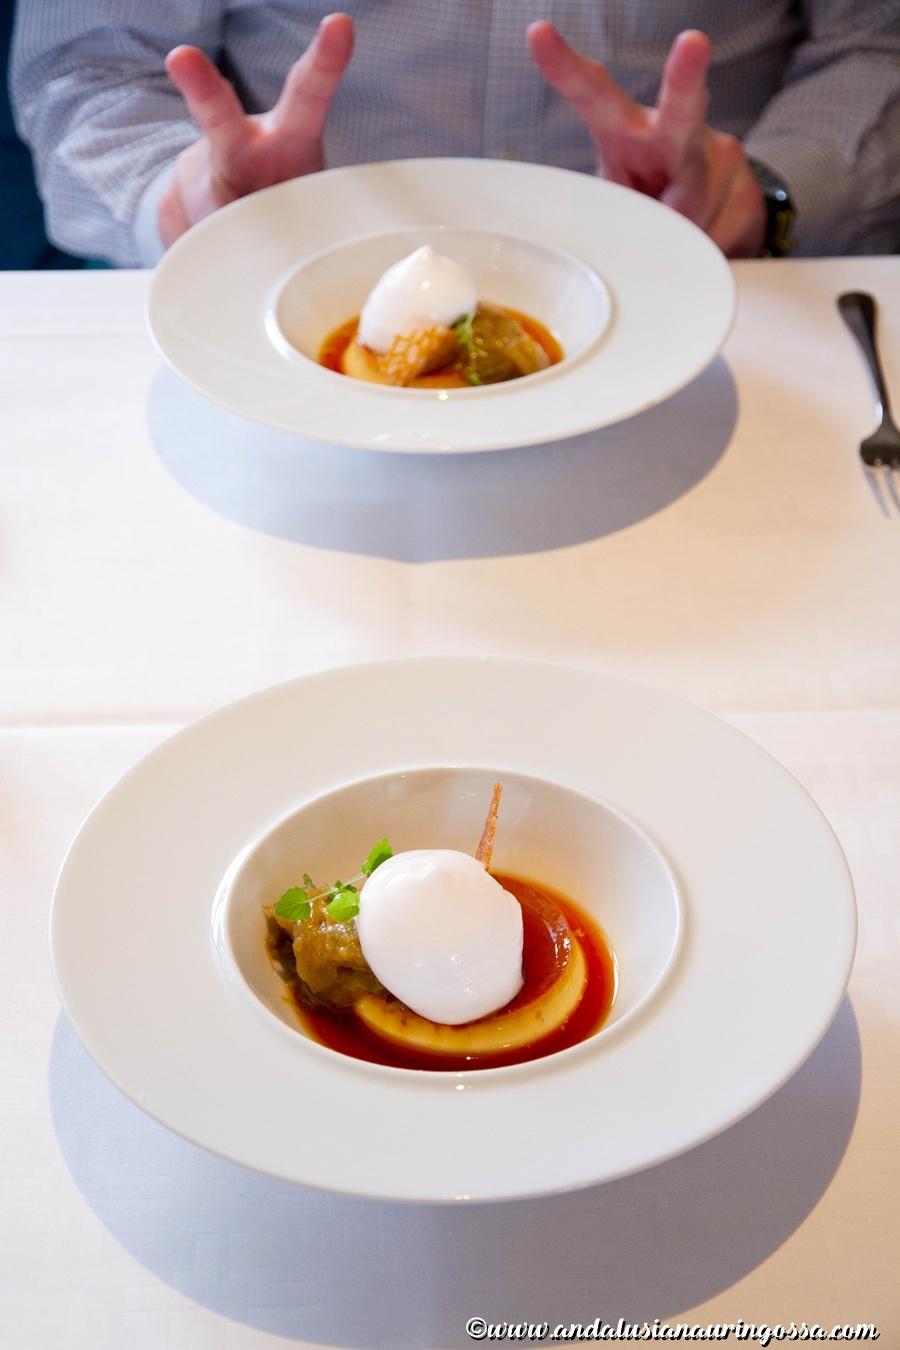 Sjomagasinet_Goteborg_Michelin ravintola_ravintolasuositus_Andalusian Auringossa_ruokablogi_matkablogi_10